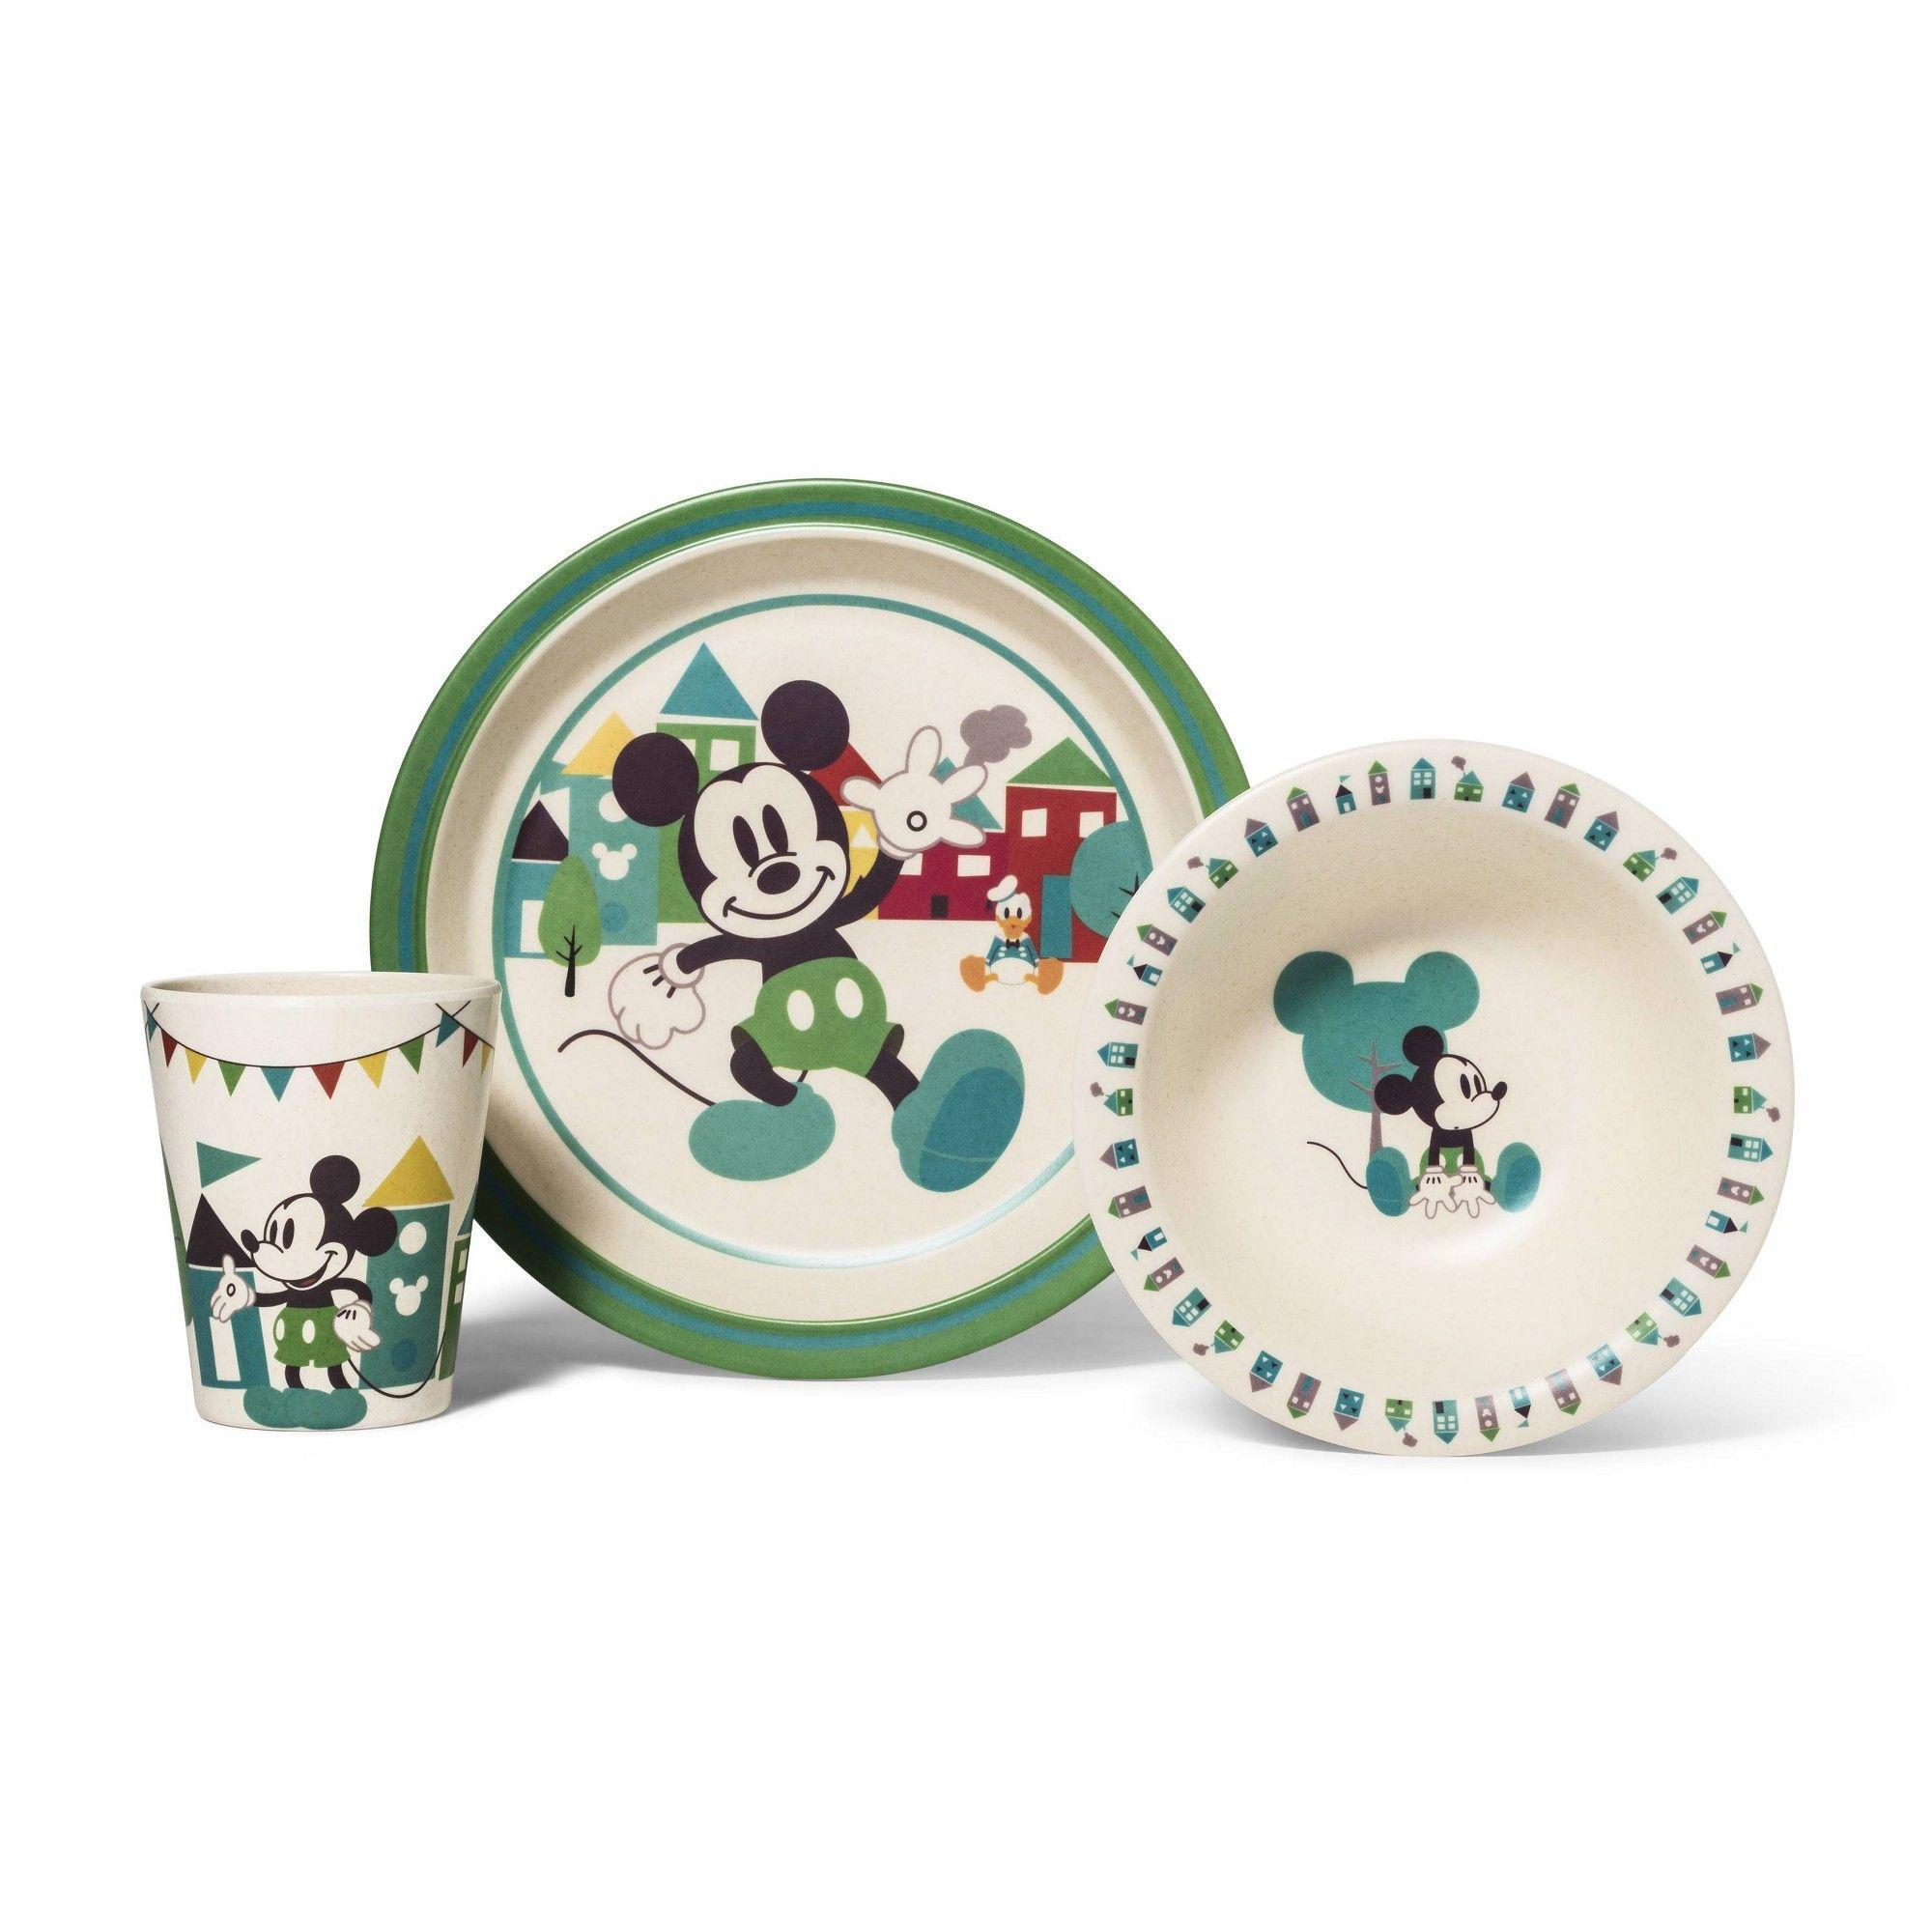 Disney Mickey Mouse 3pc Bamboo Dinner Set, Adult Unisex